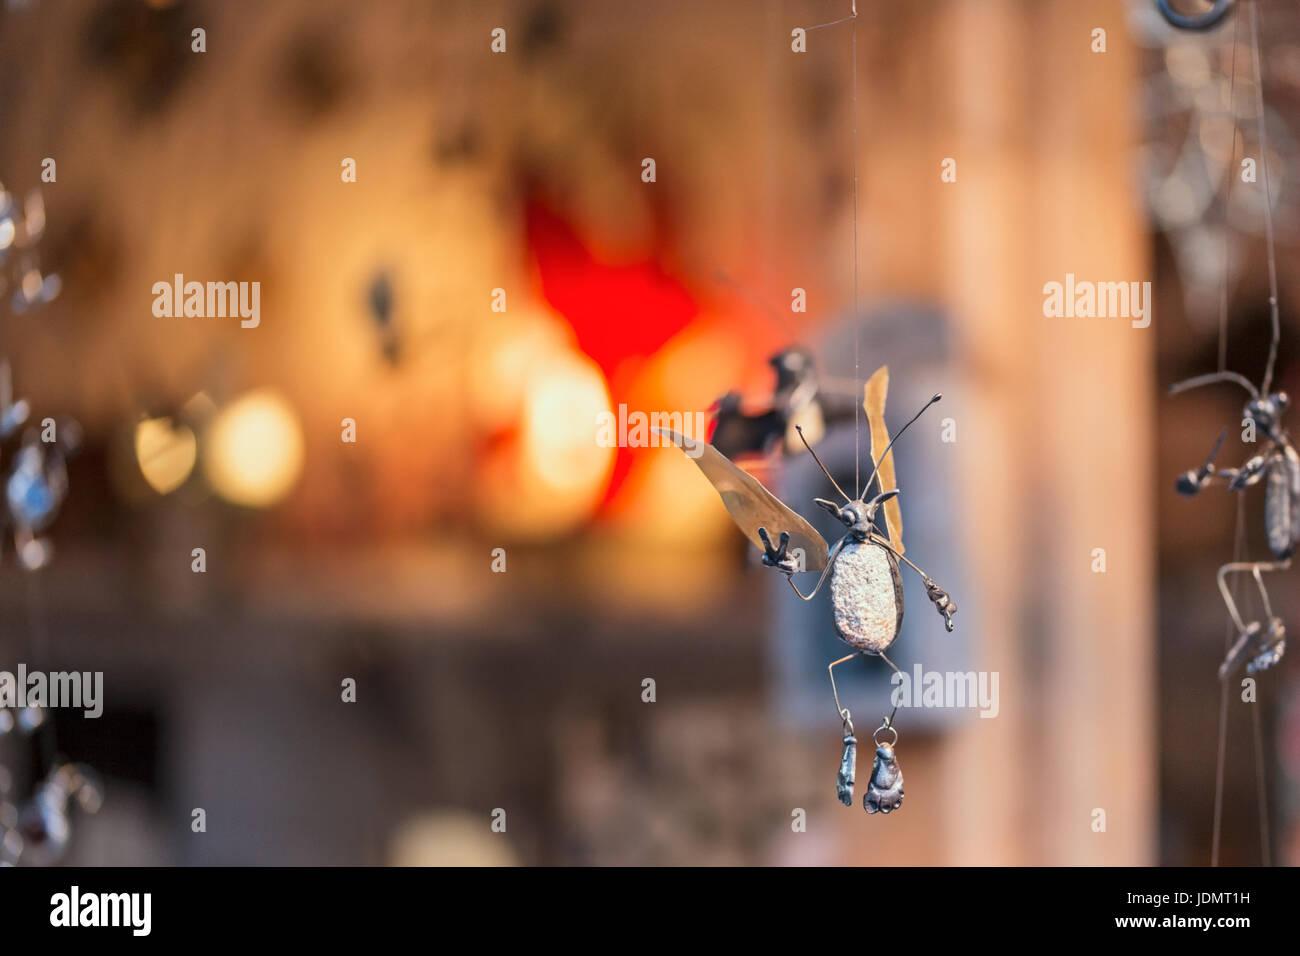 Winter Wonderland Christmas Market In Stockfotos & Winter Wonderland ...